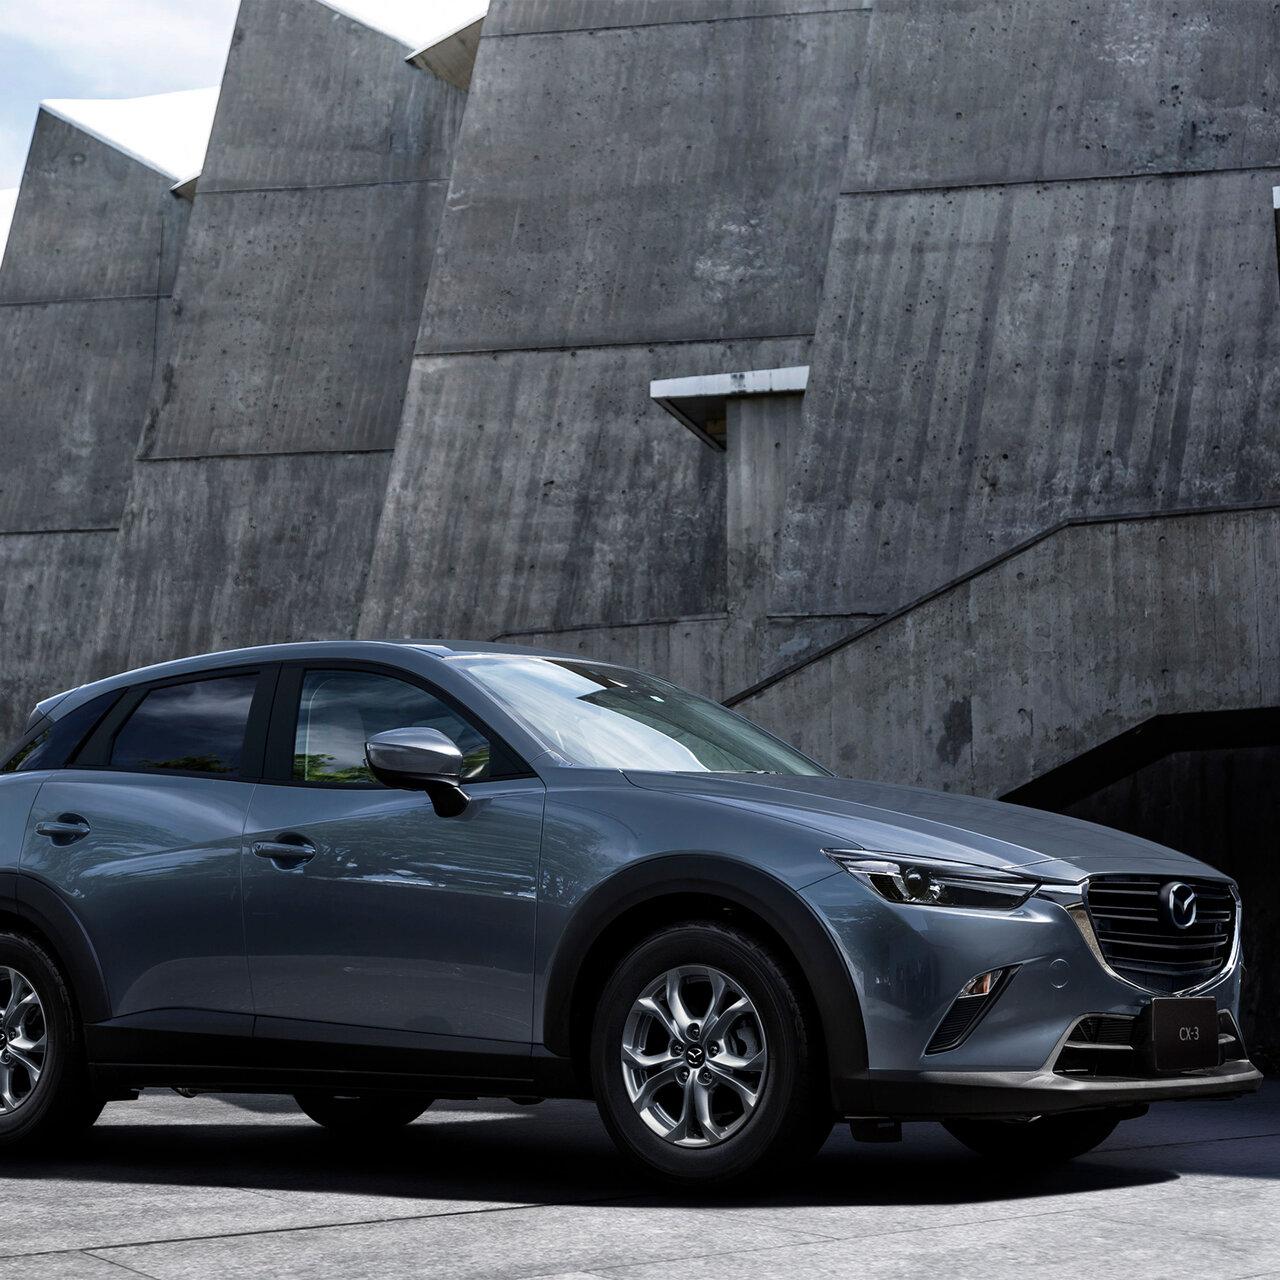 CX-3に1.5リッターエンジンや新色ボディカラーなどを追加 Mazda